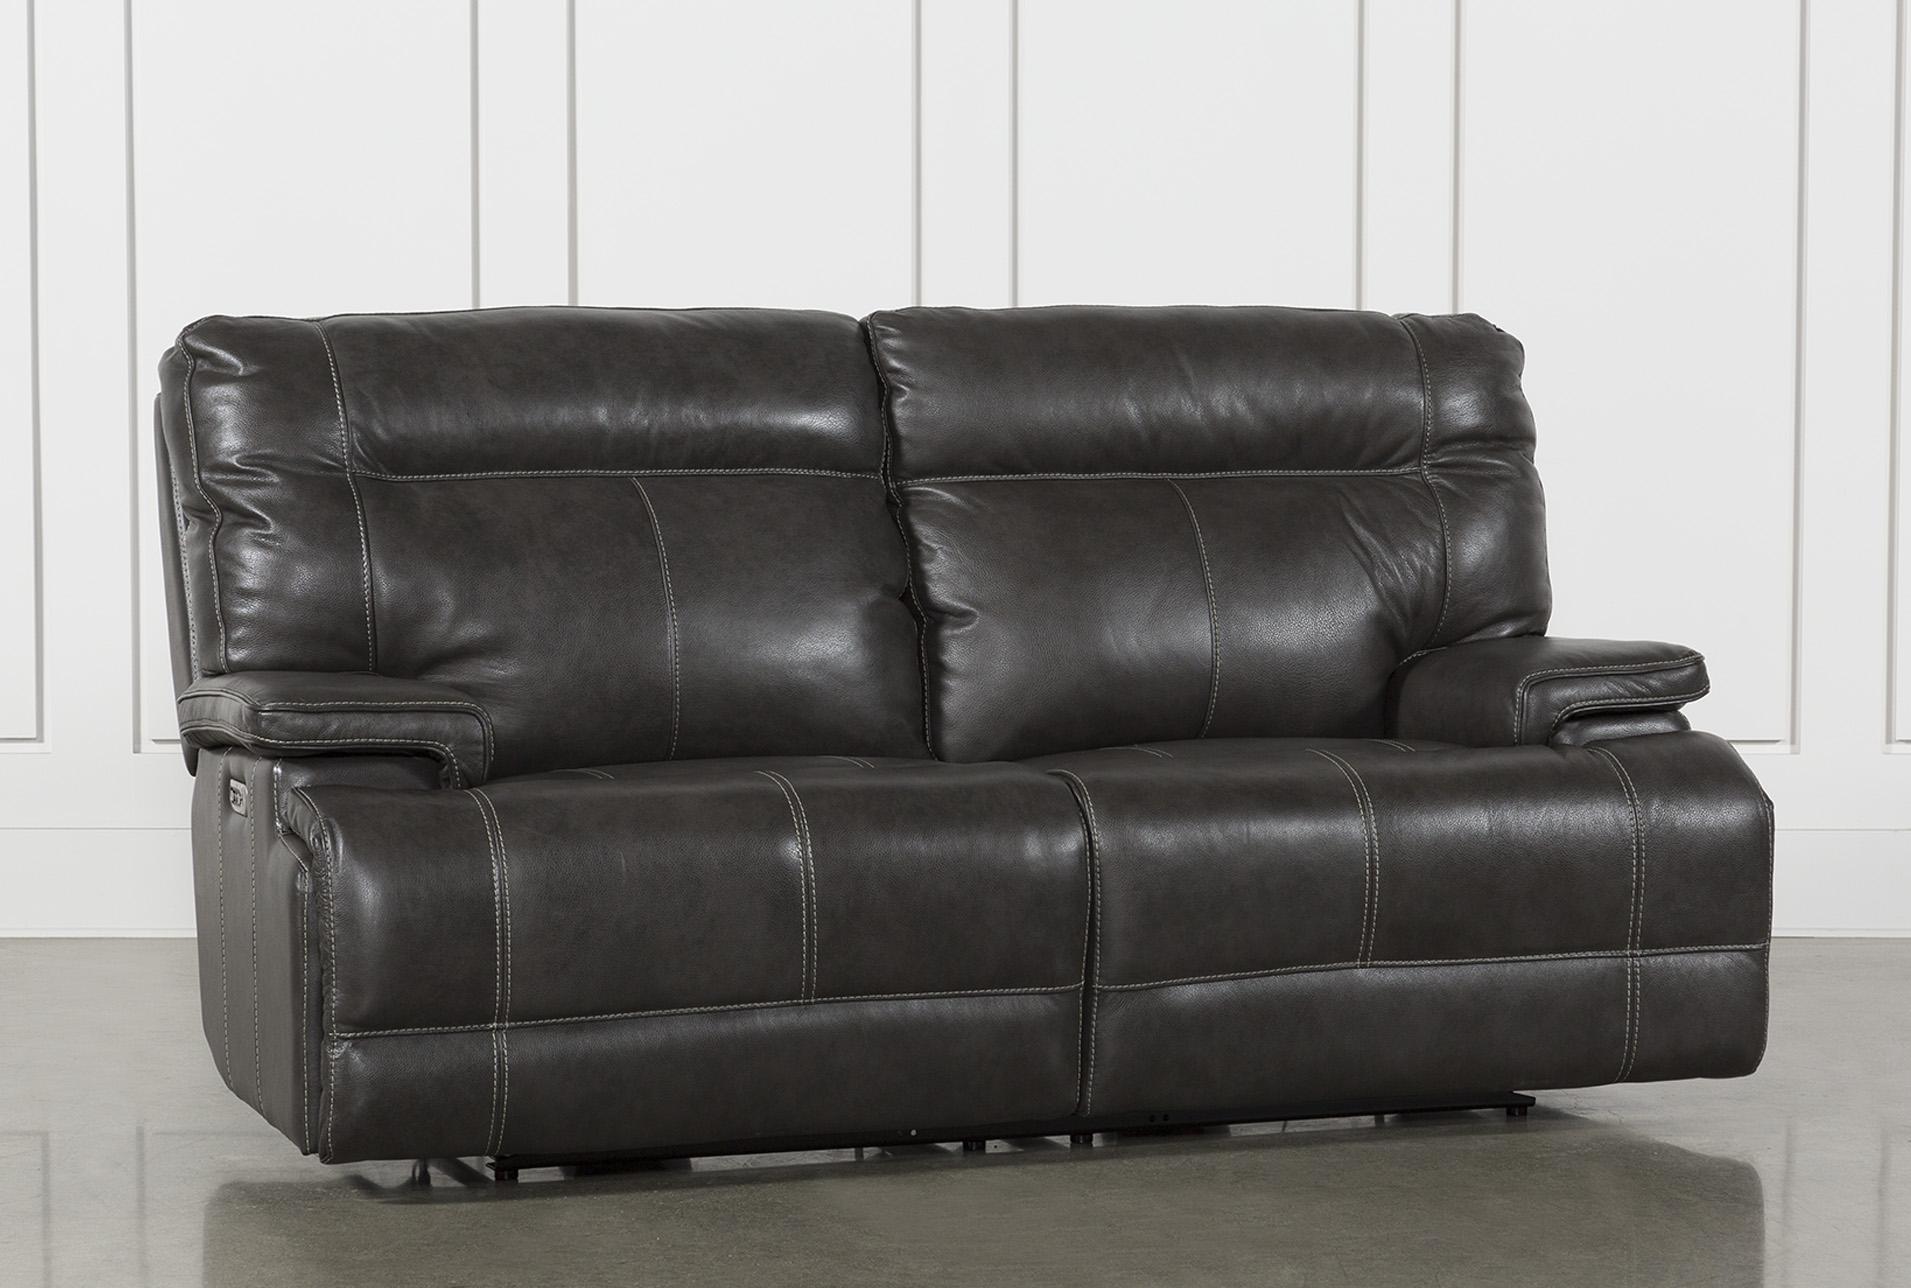 grey power reclining sofa gray images marius dark with headrest